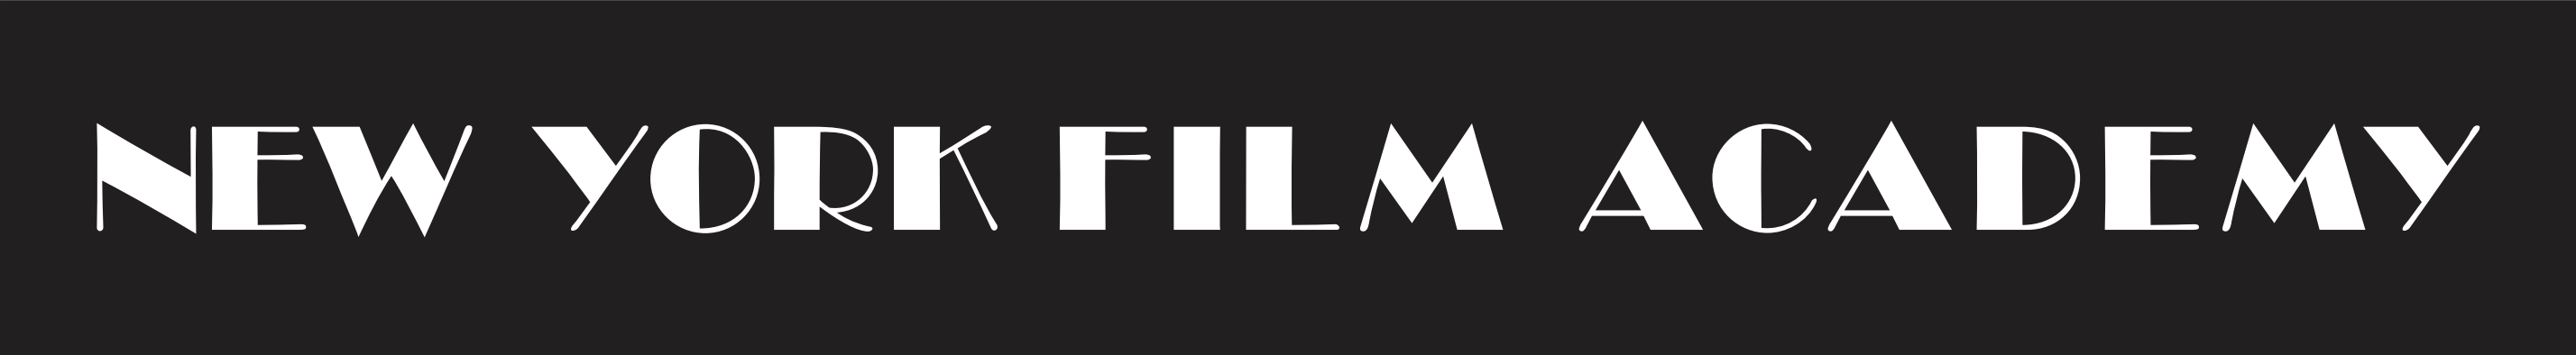 NYFA Black Headline Logo